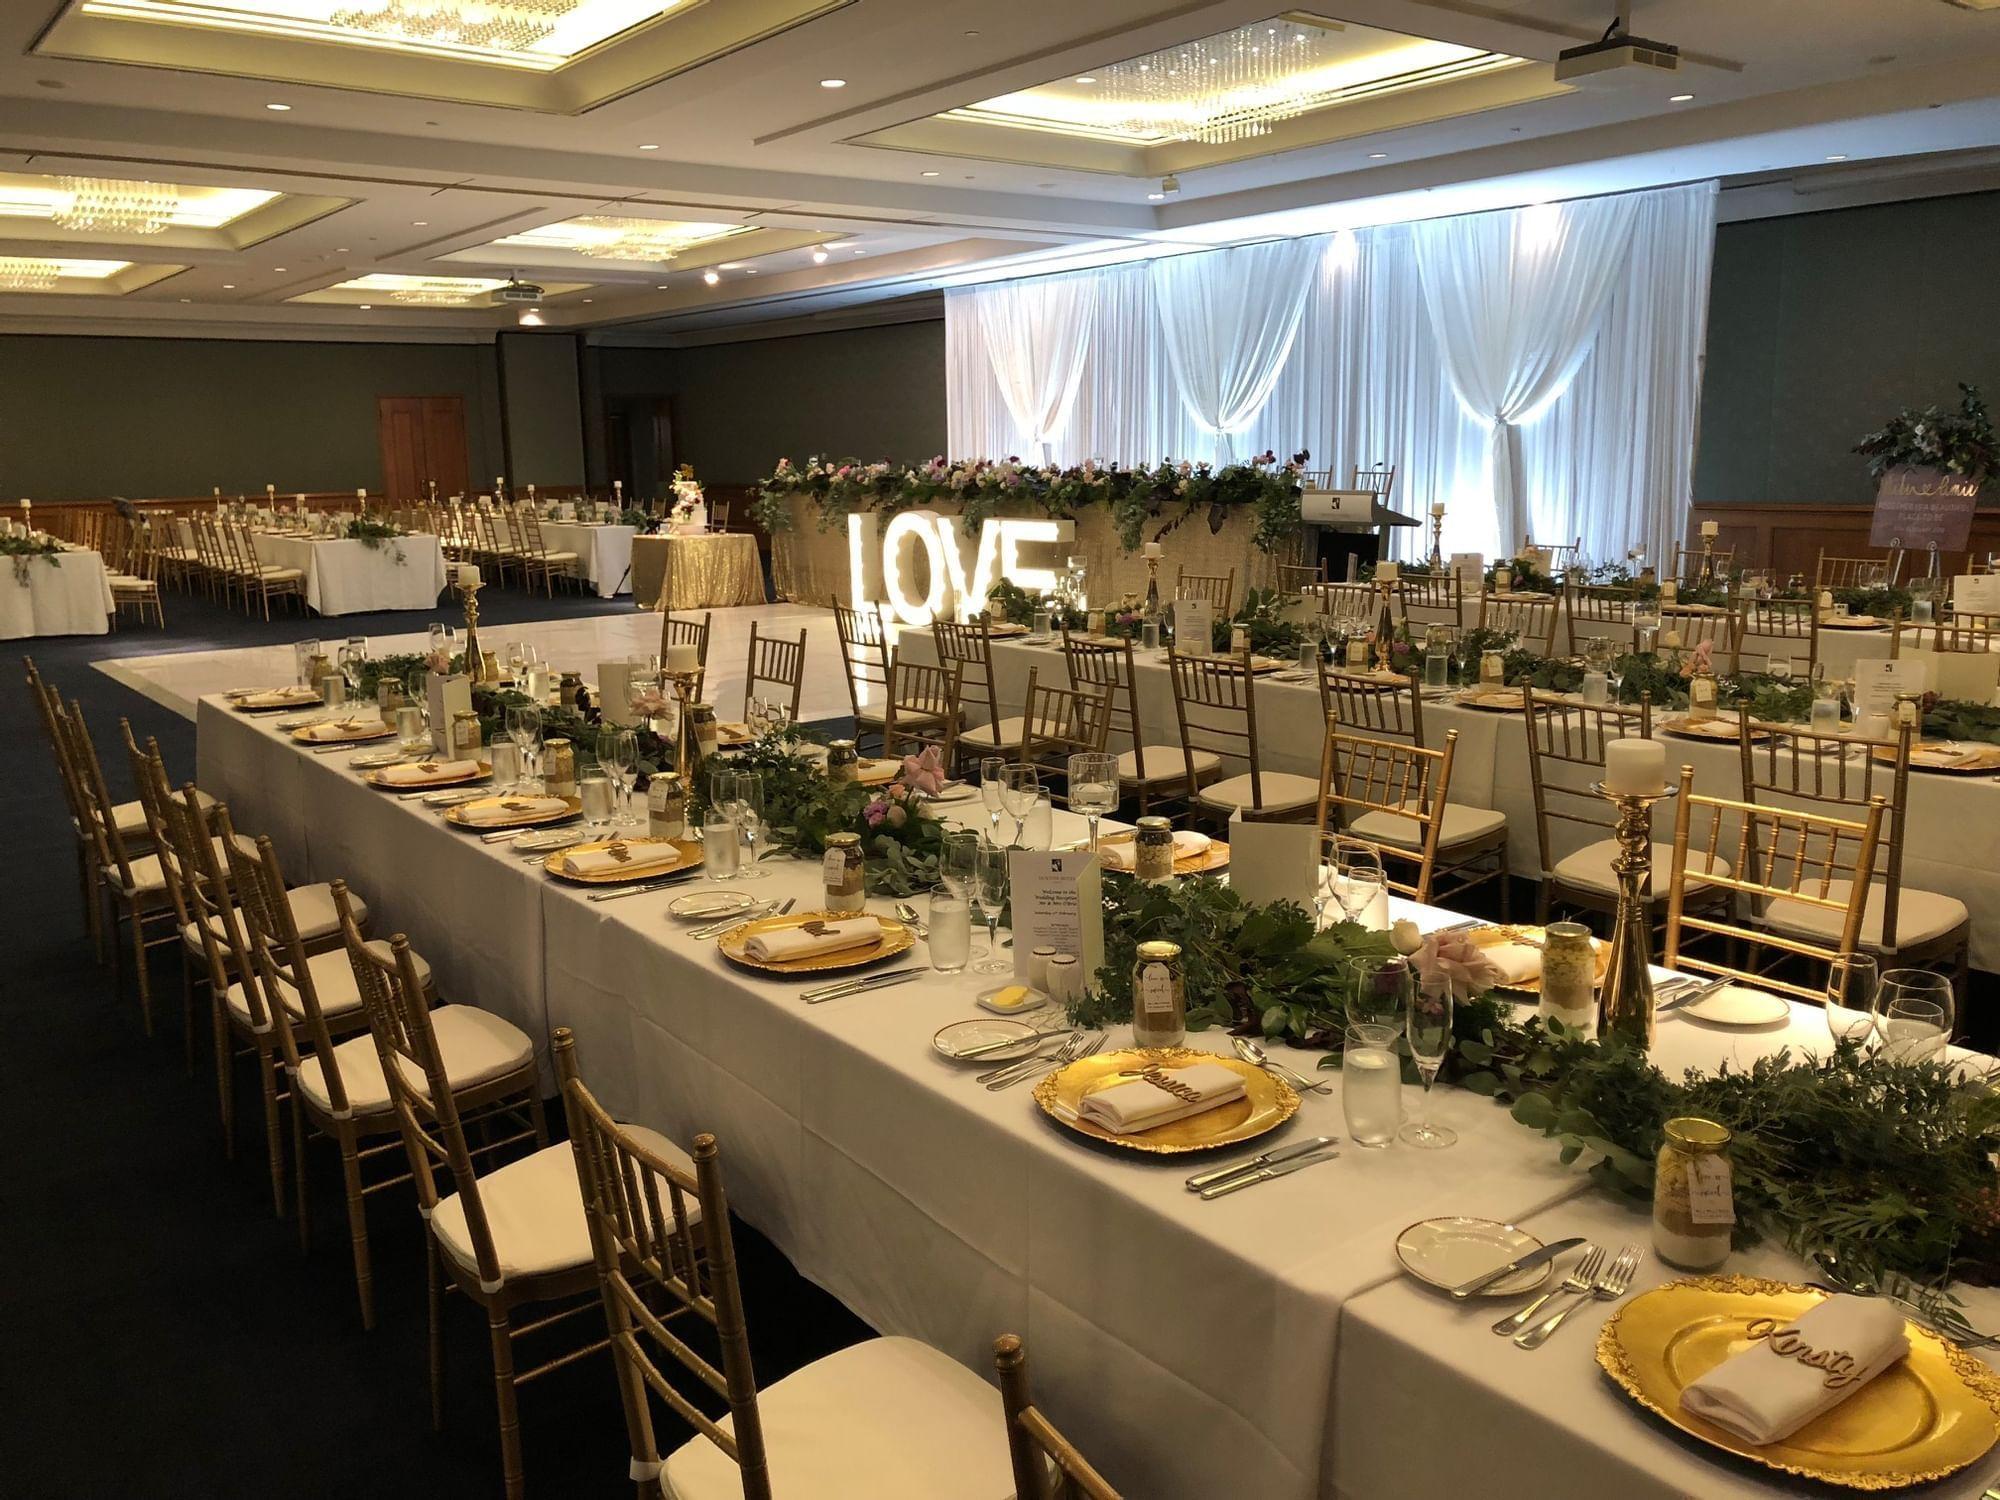 Table setup of the Ballroom wedding reception at Duxton Hotel